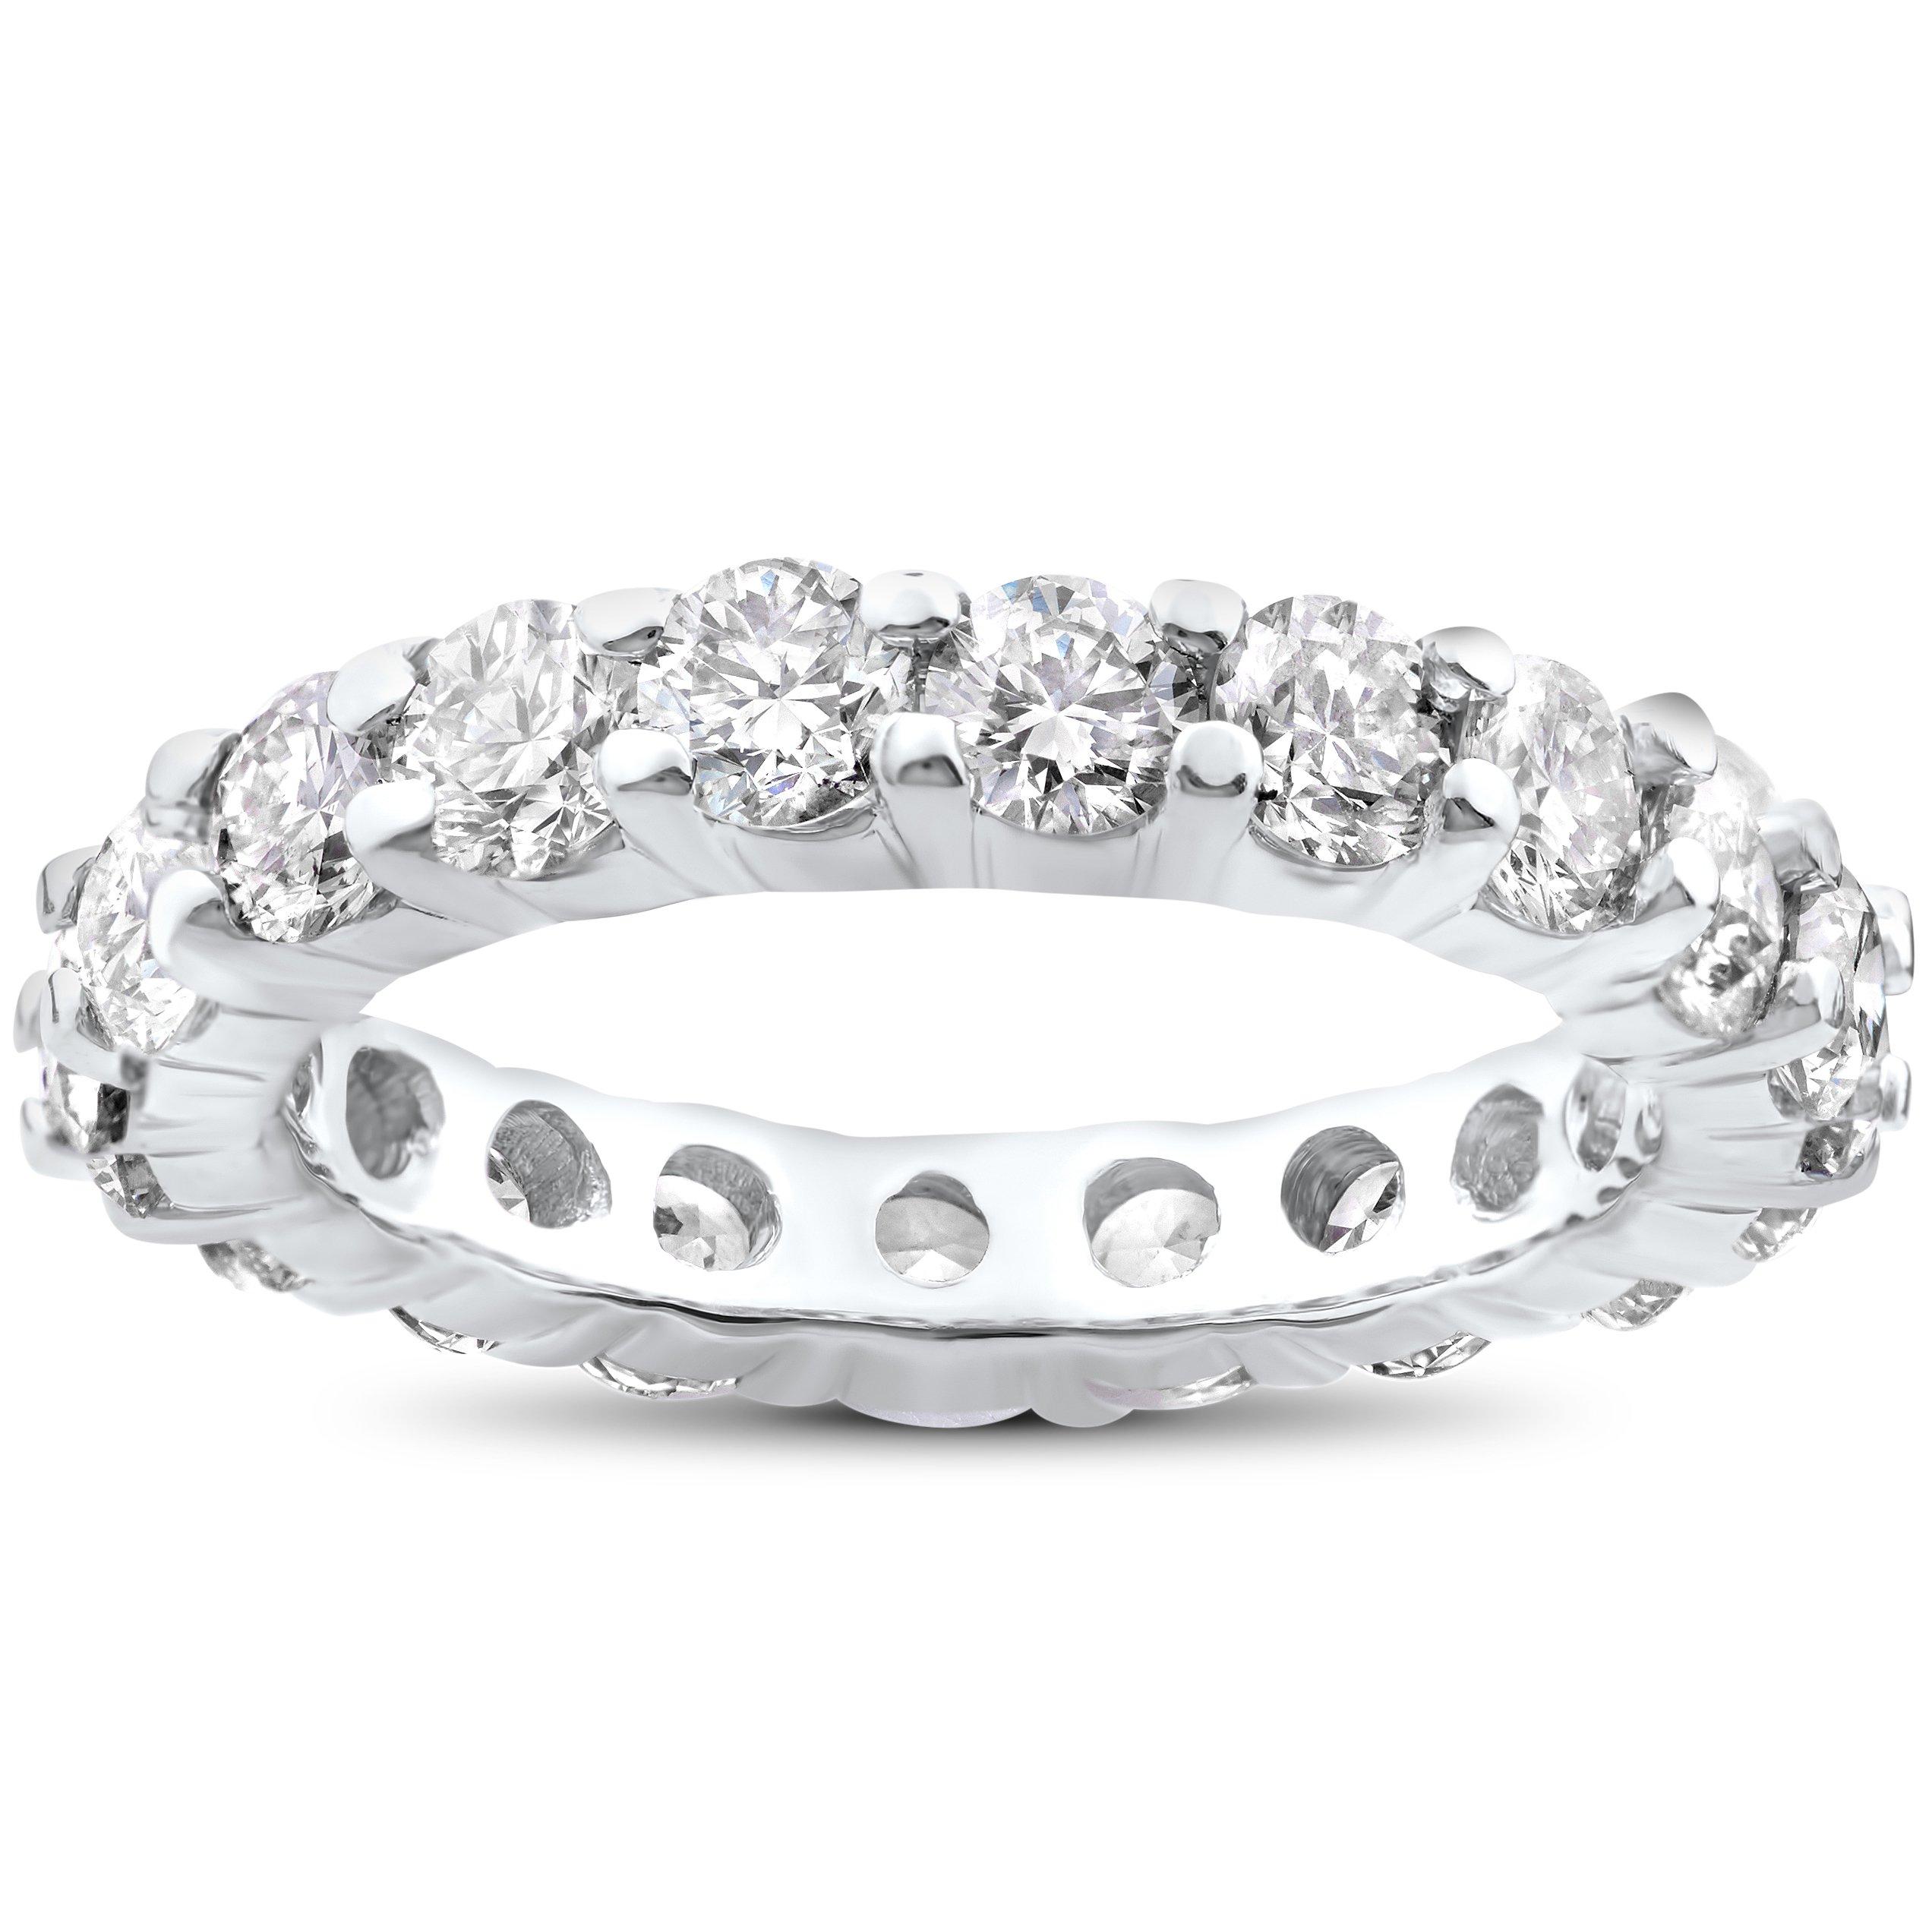 4 ct Diamond Eternity Wedding Ring 14K White Gold